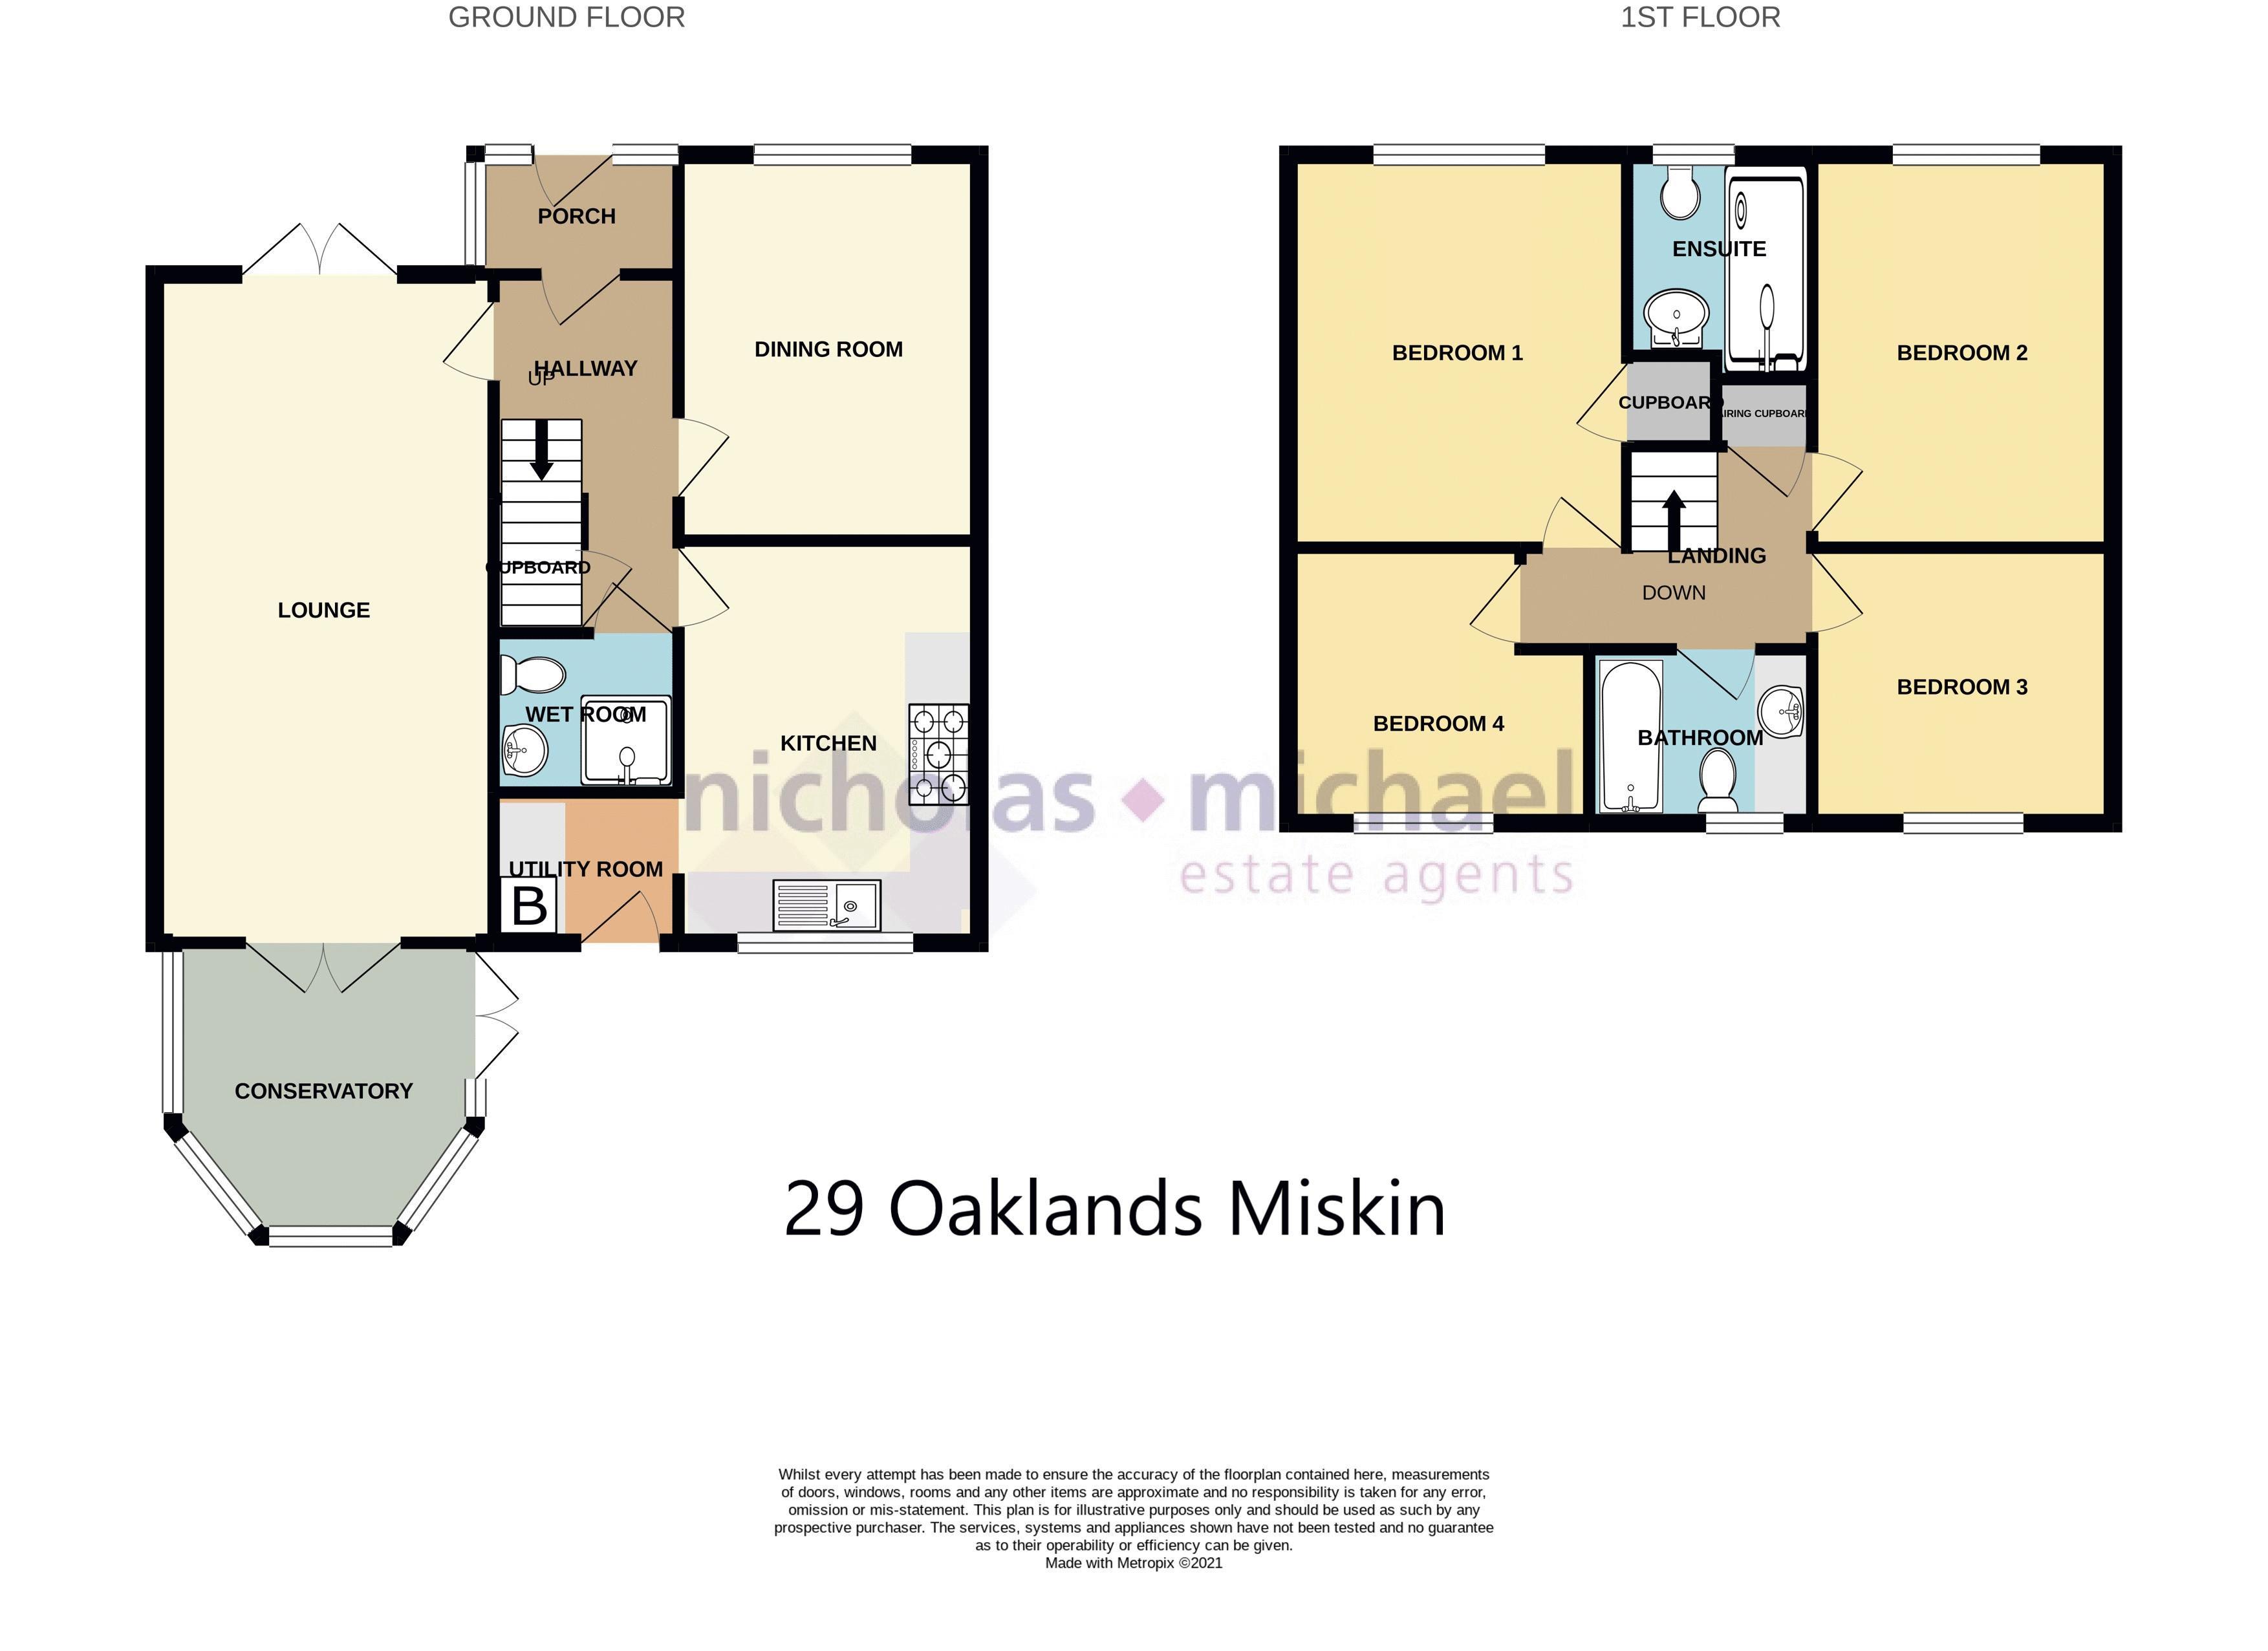 Oaklands Miskin